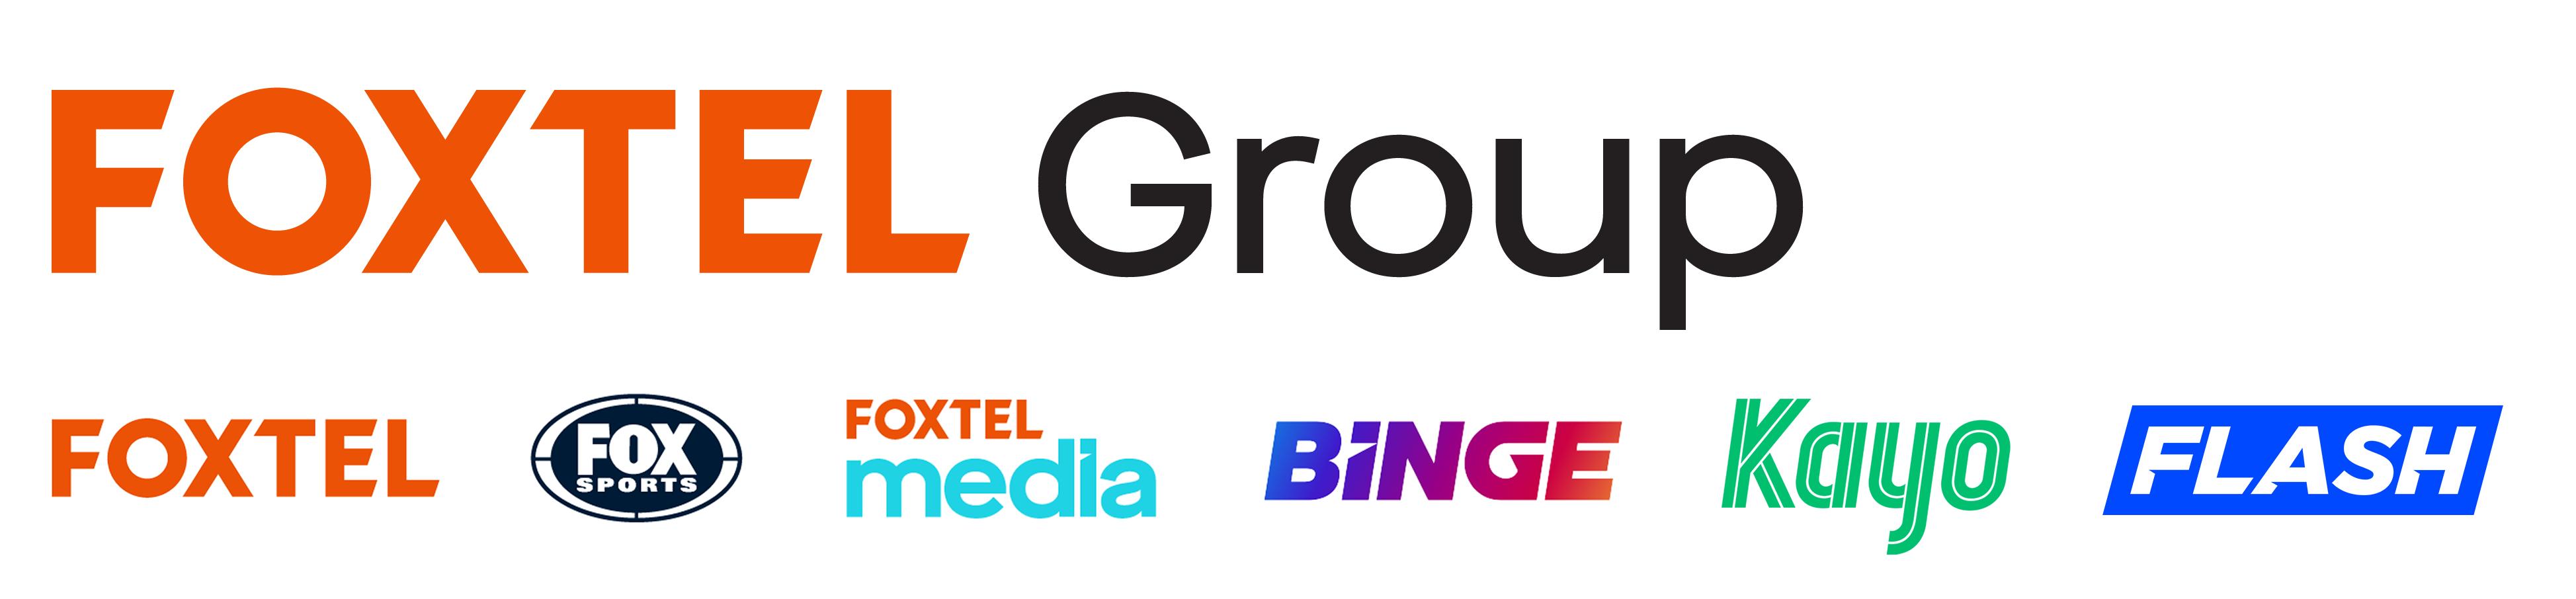 Foxtel Logo with brand logos